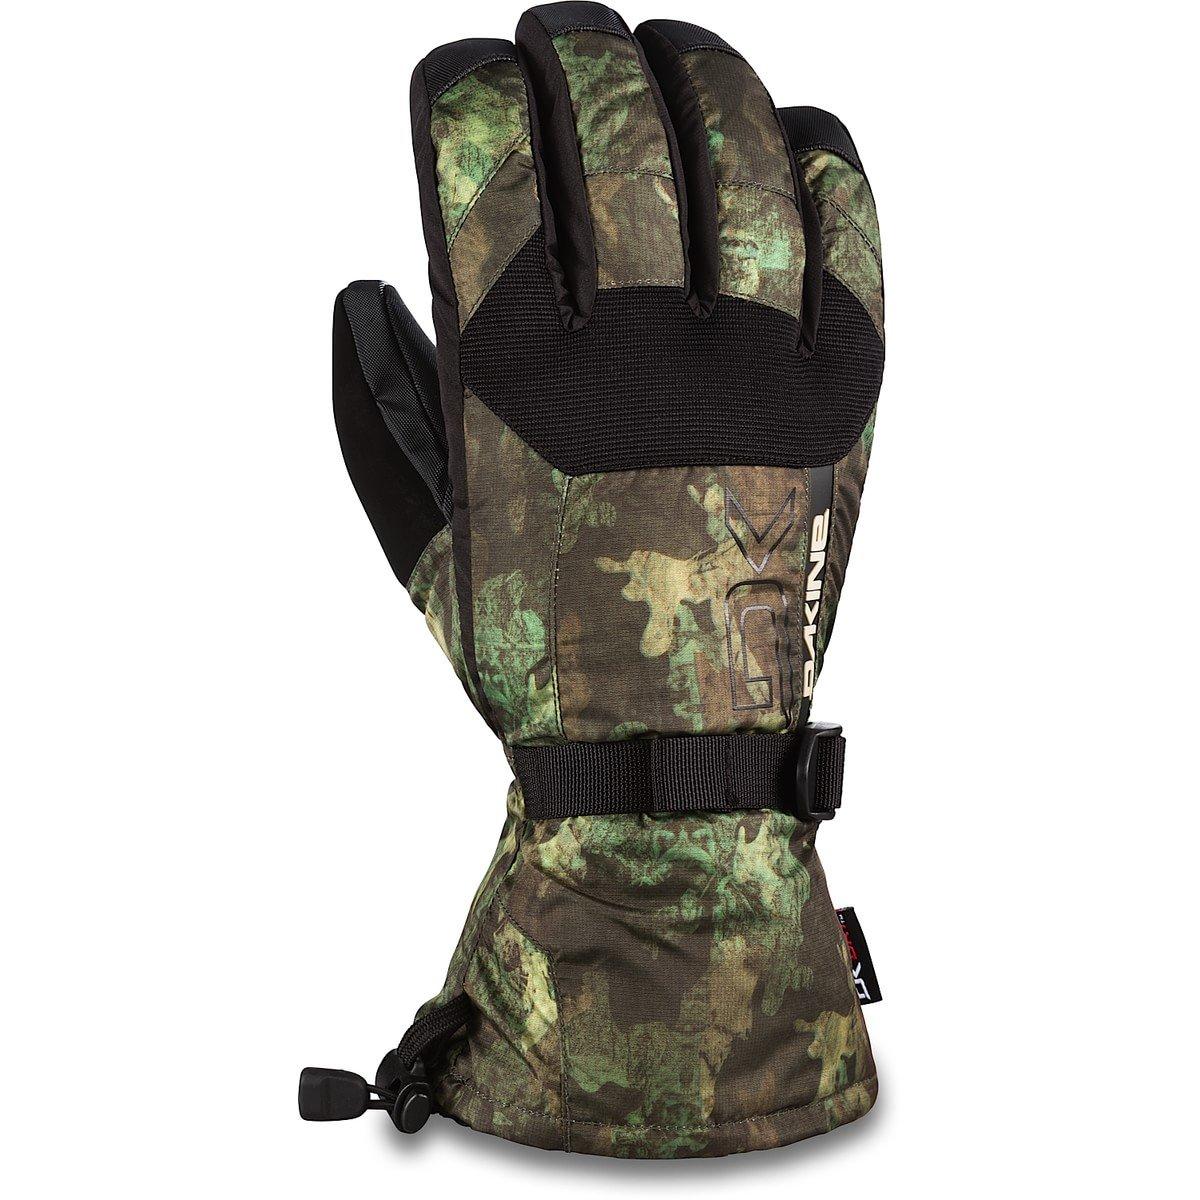 Dakine Men's Scout Gloves, X-Large, Peat Camo by Dakine